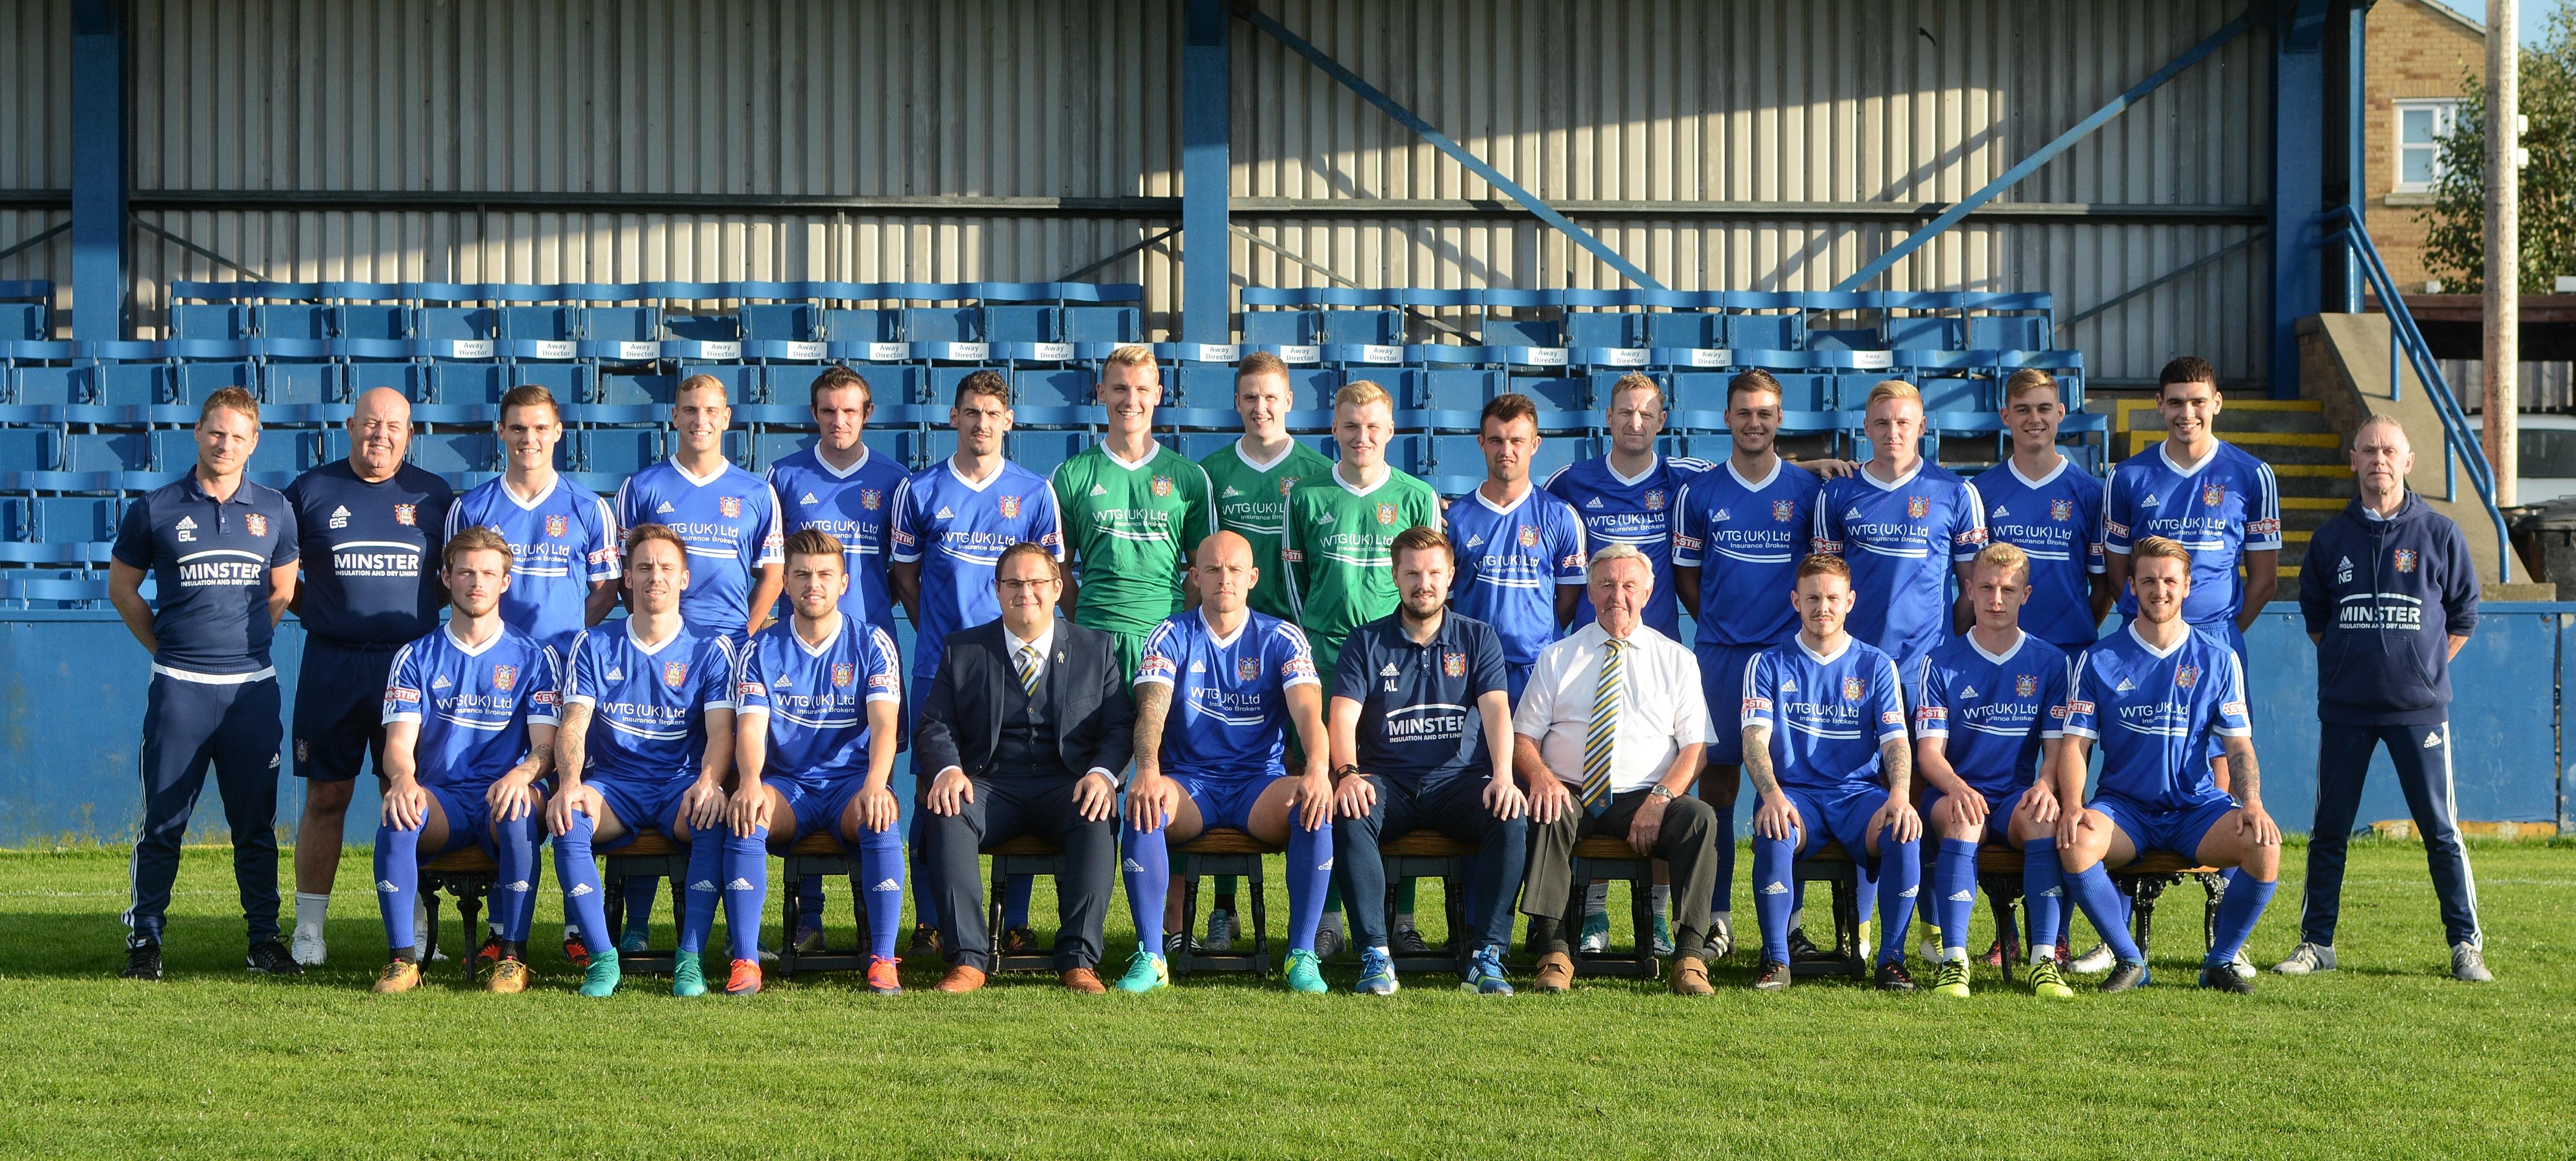 Farsley Fc 1 Vs 0 Durham City 6 December 2011 Farsley Celtic